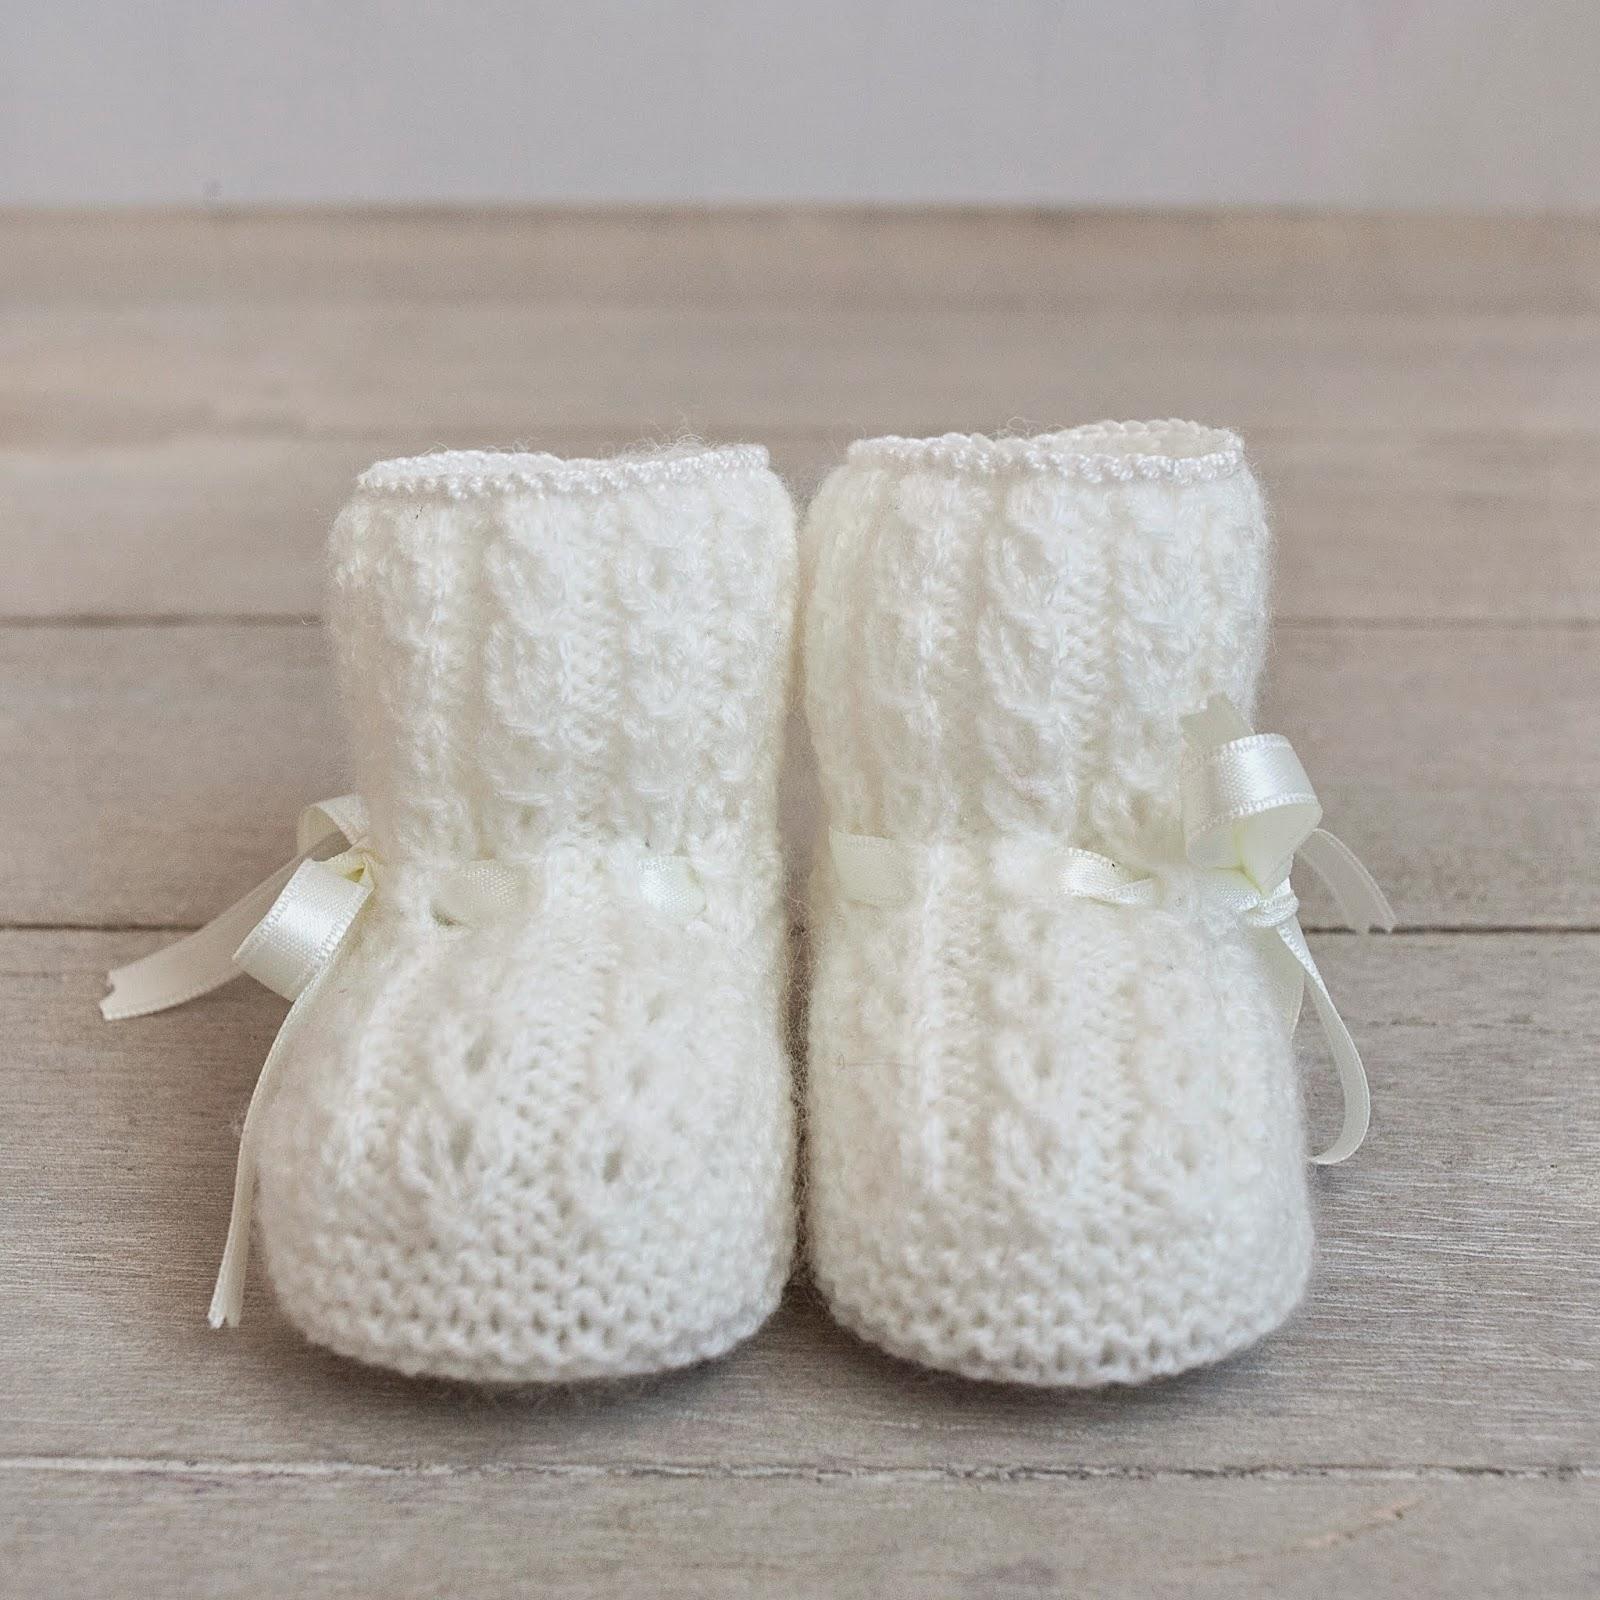 Patucos para bebé tejidos a mano